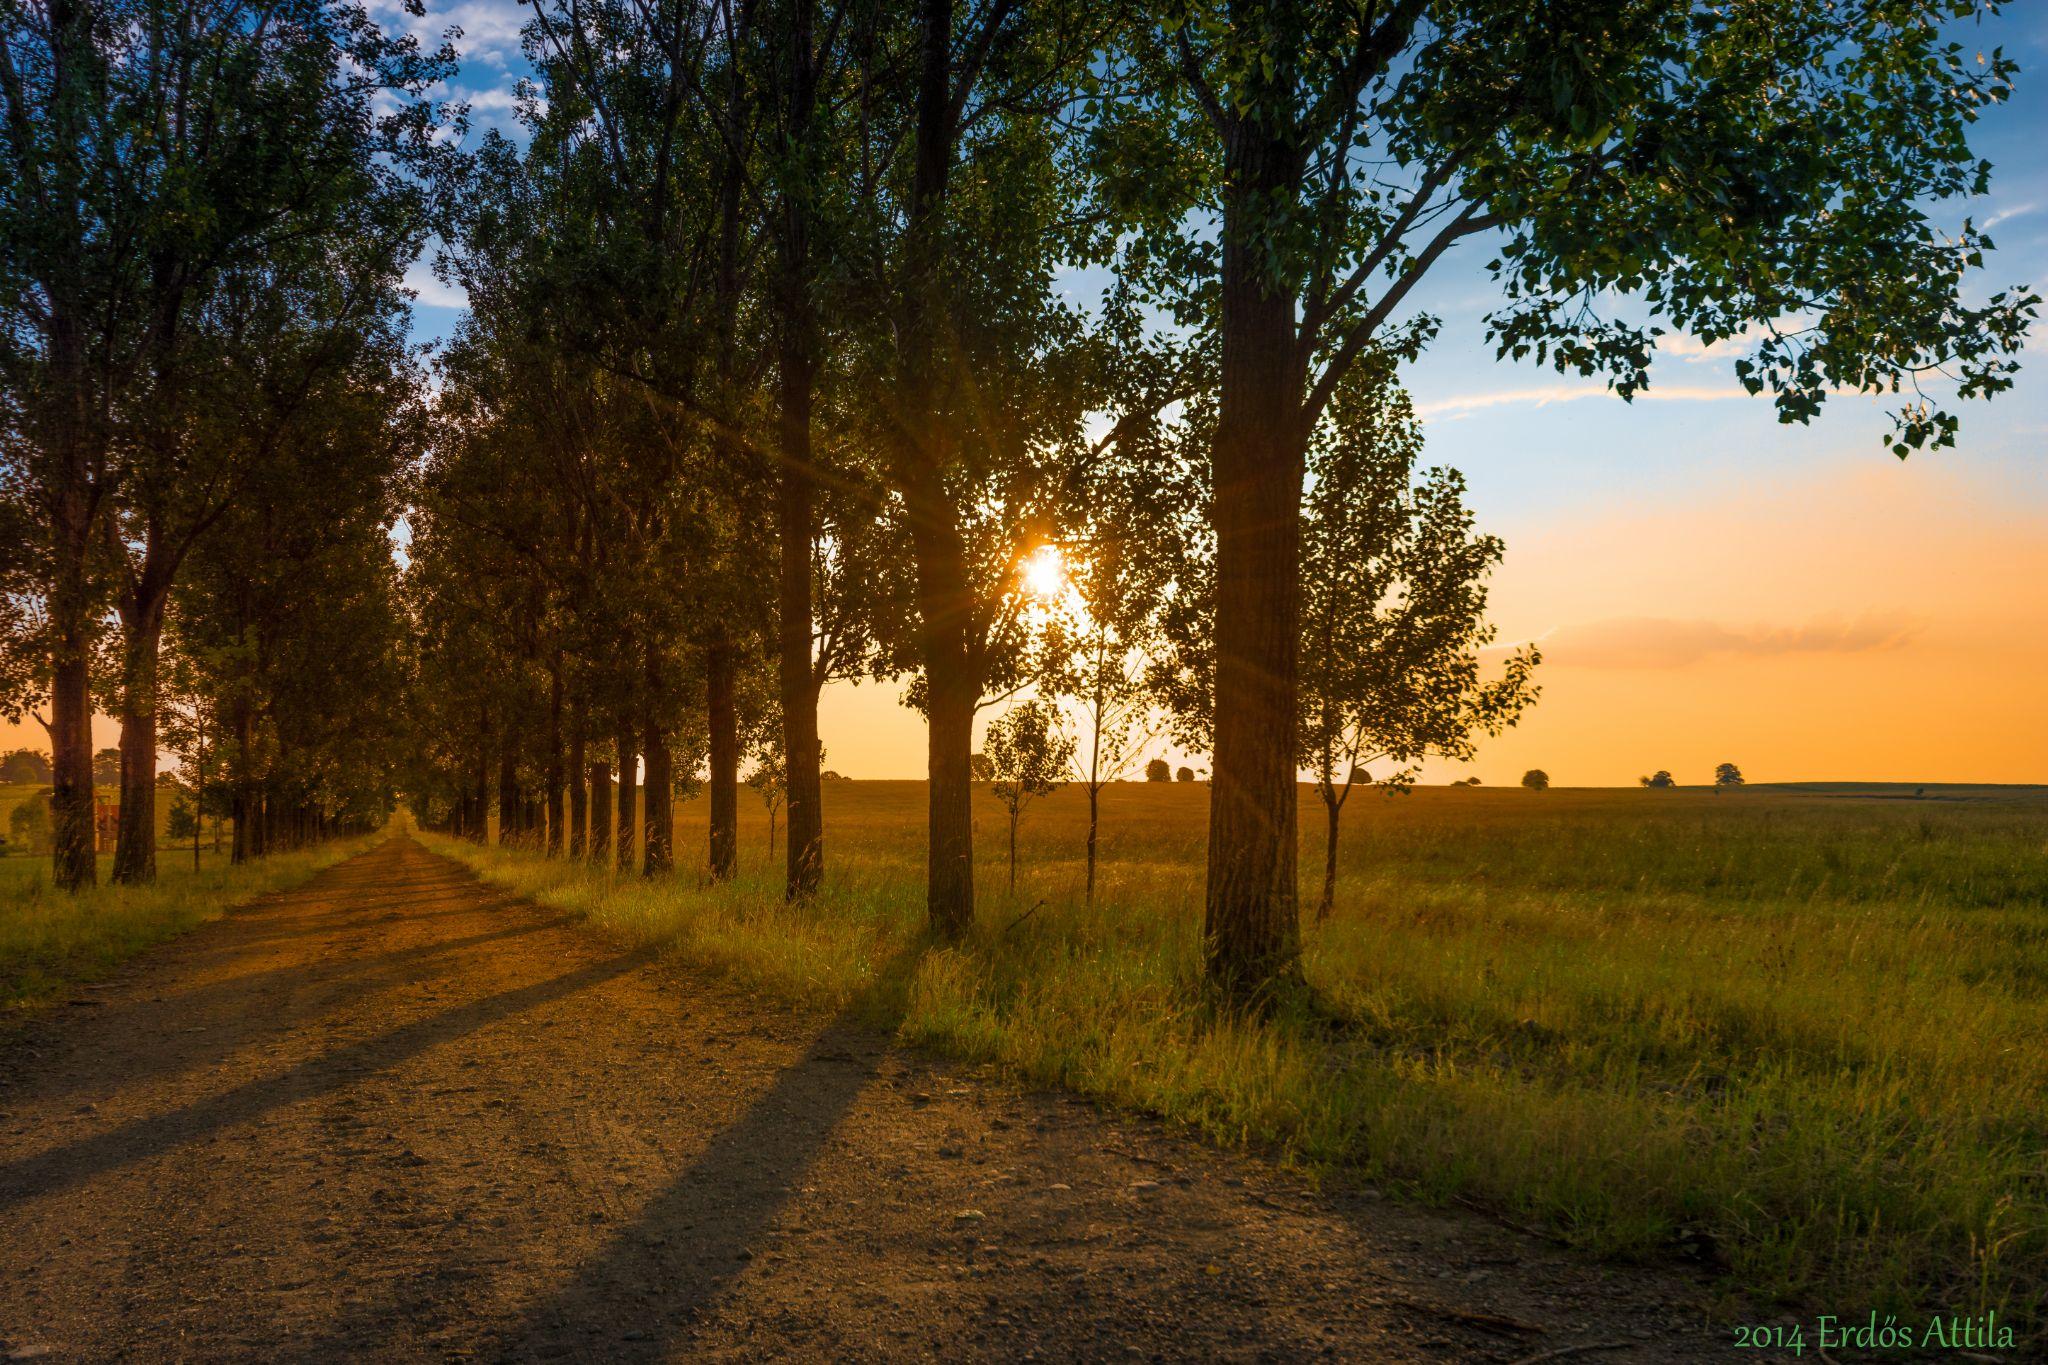 Long Way to Go by rdsattila